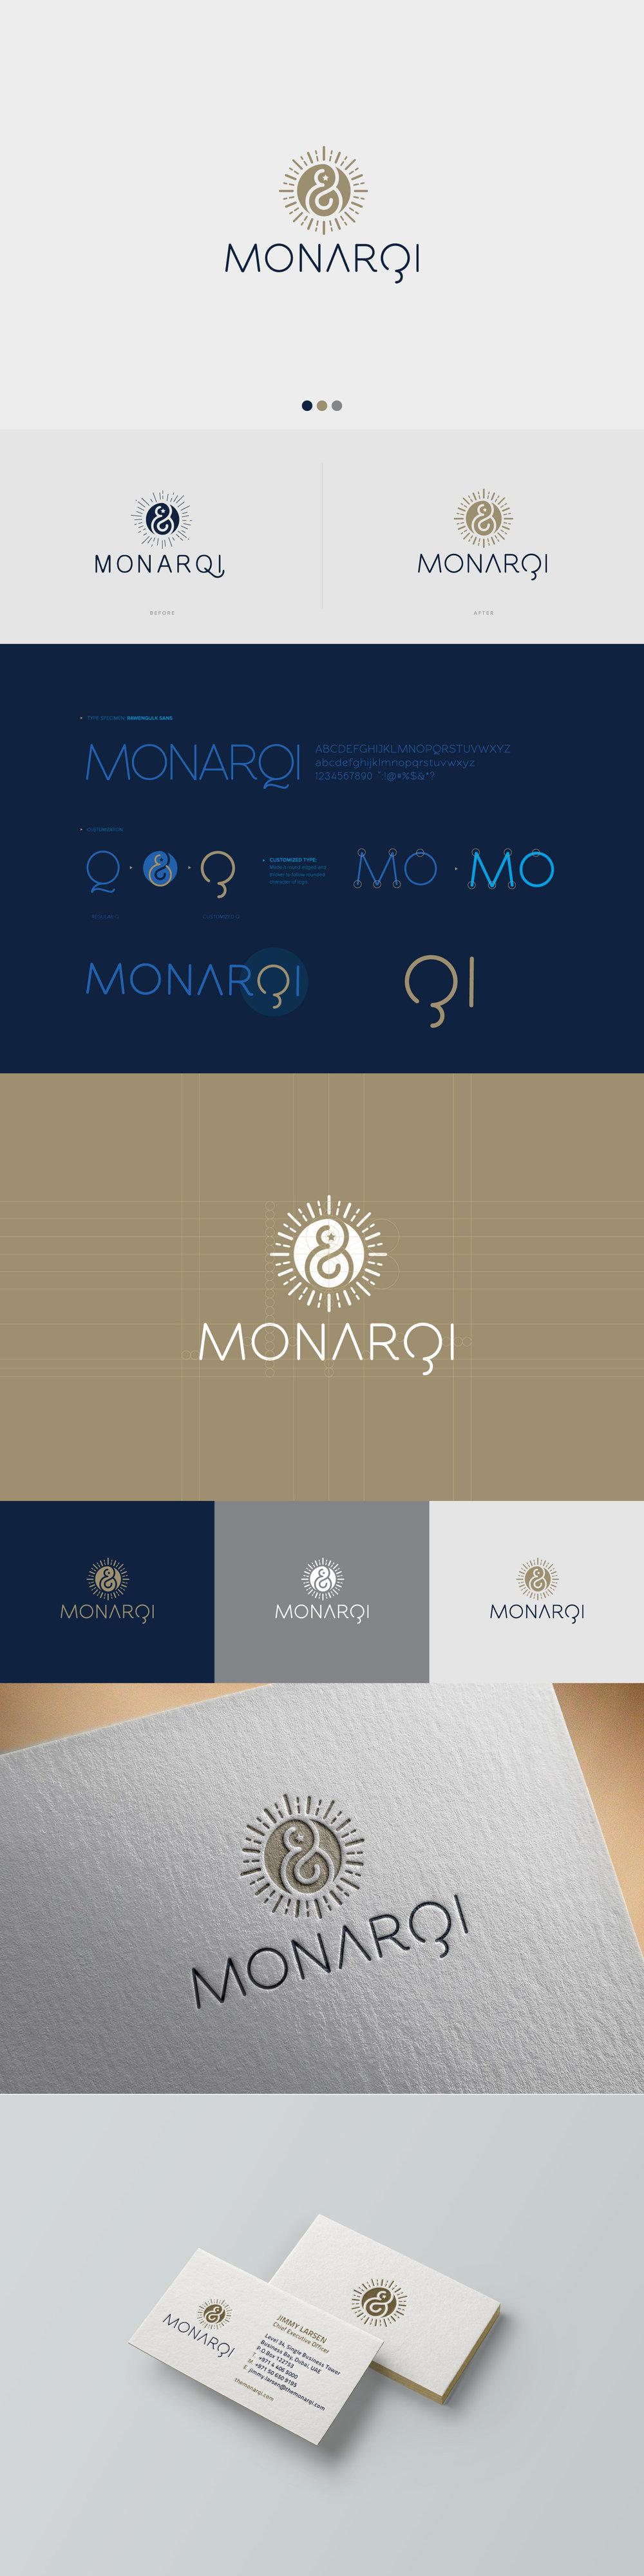 monarqi-board.jpg